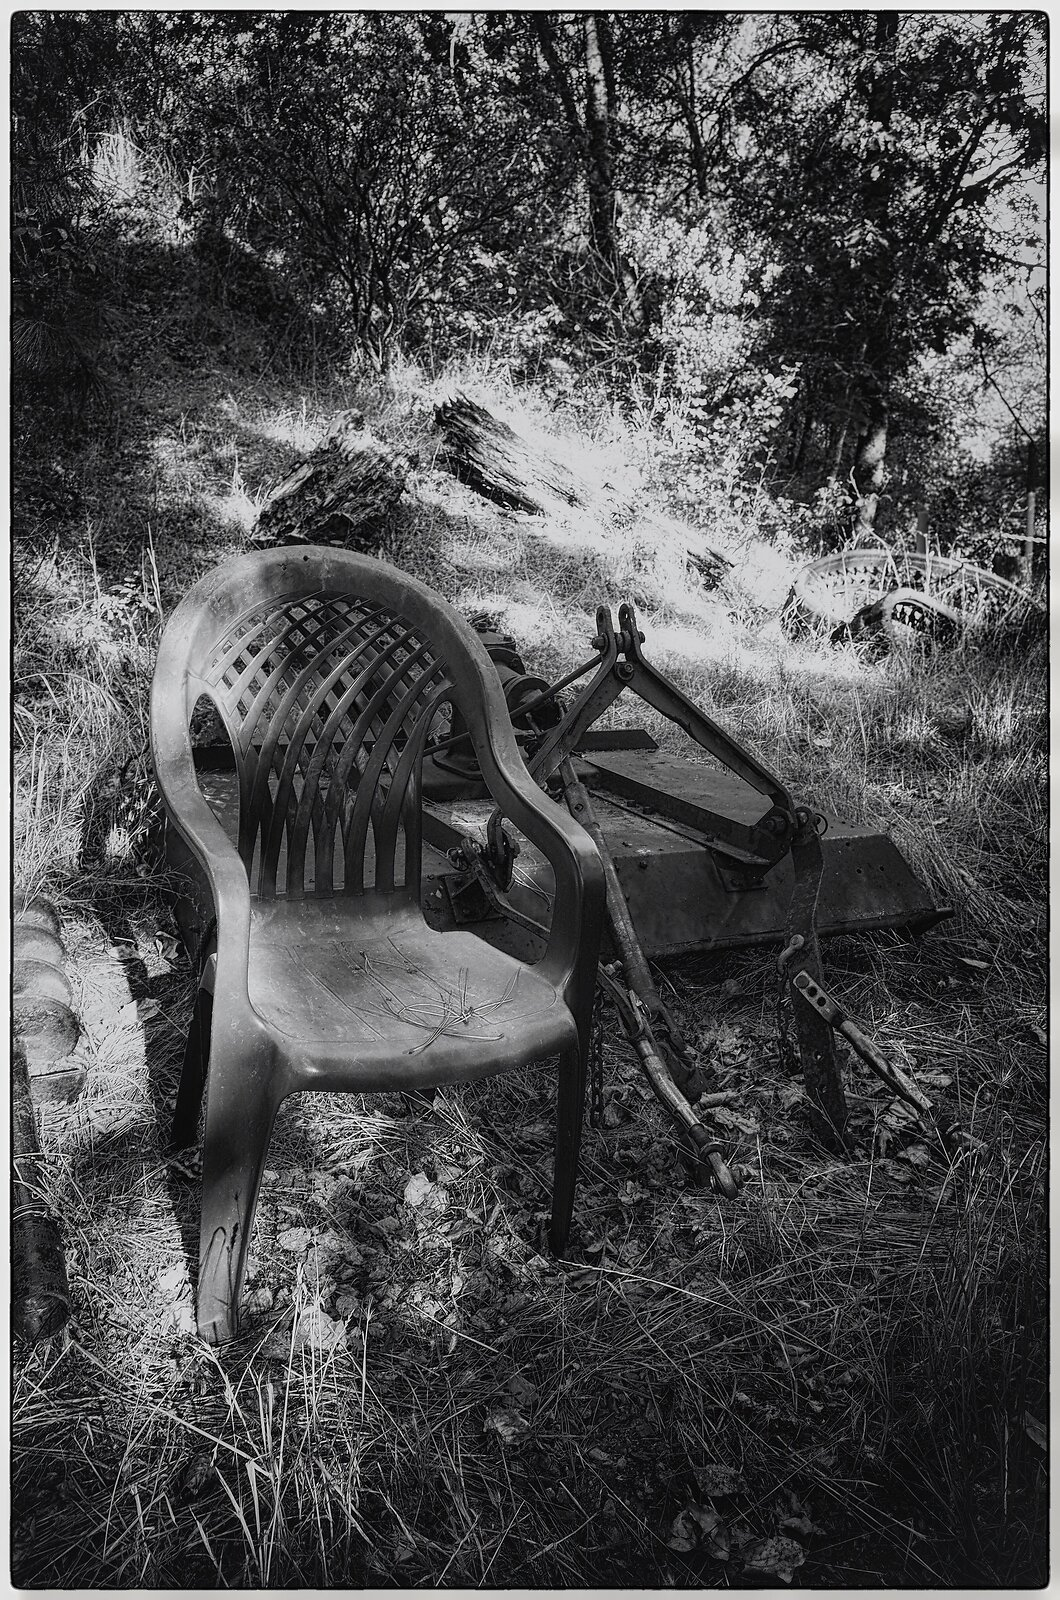 GRII_Sept2_Old_Highway_Chair#2.jpg